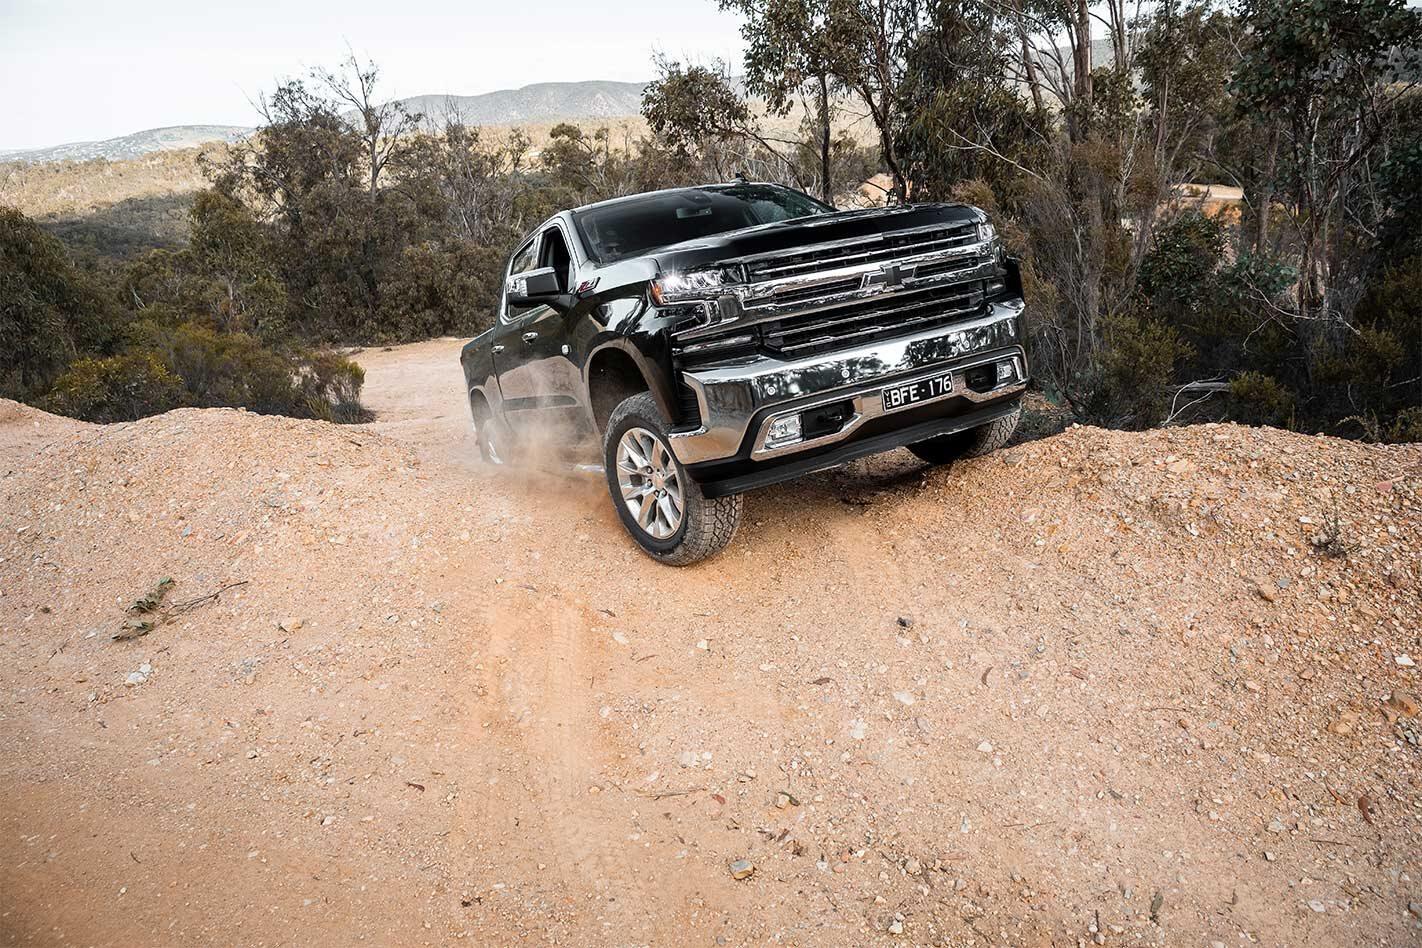 Chevrolet Silverado 1500 LTZ offroad review